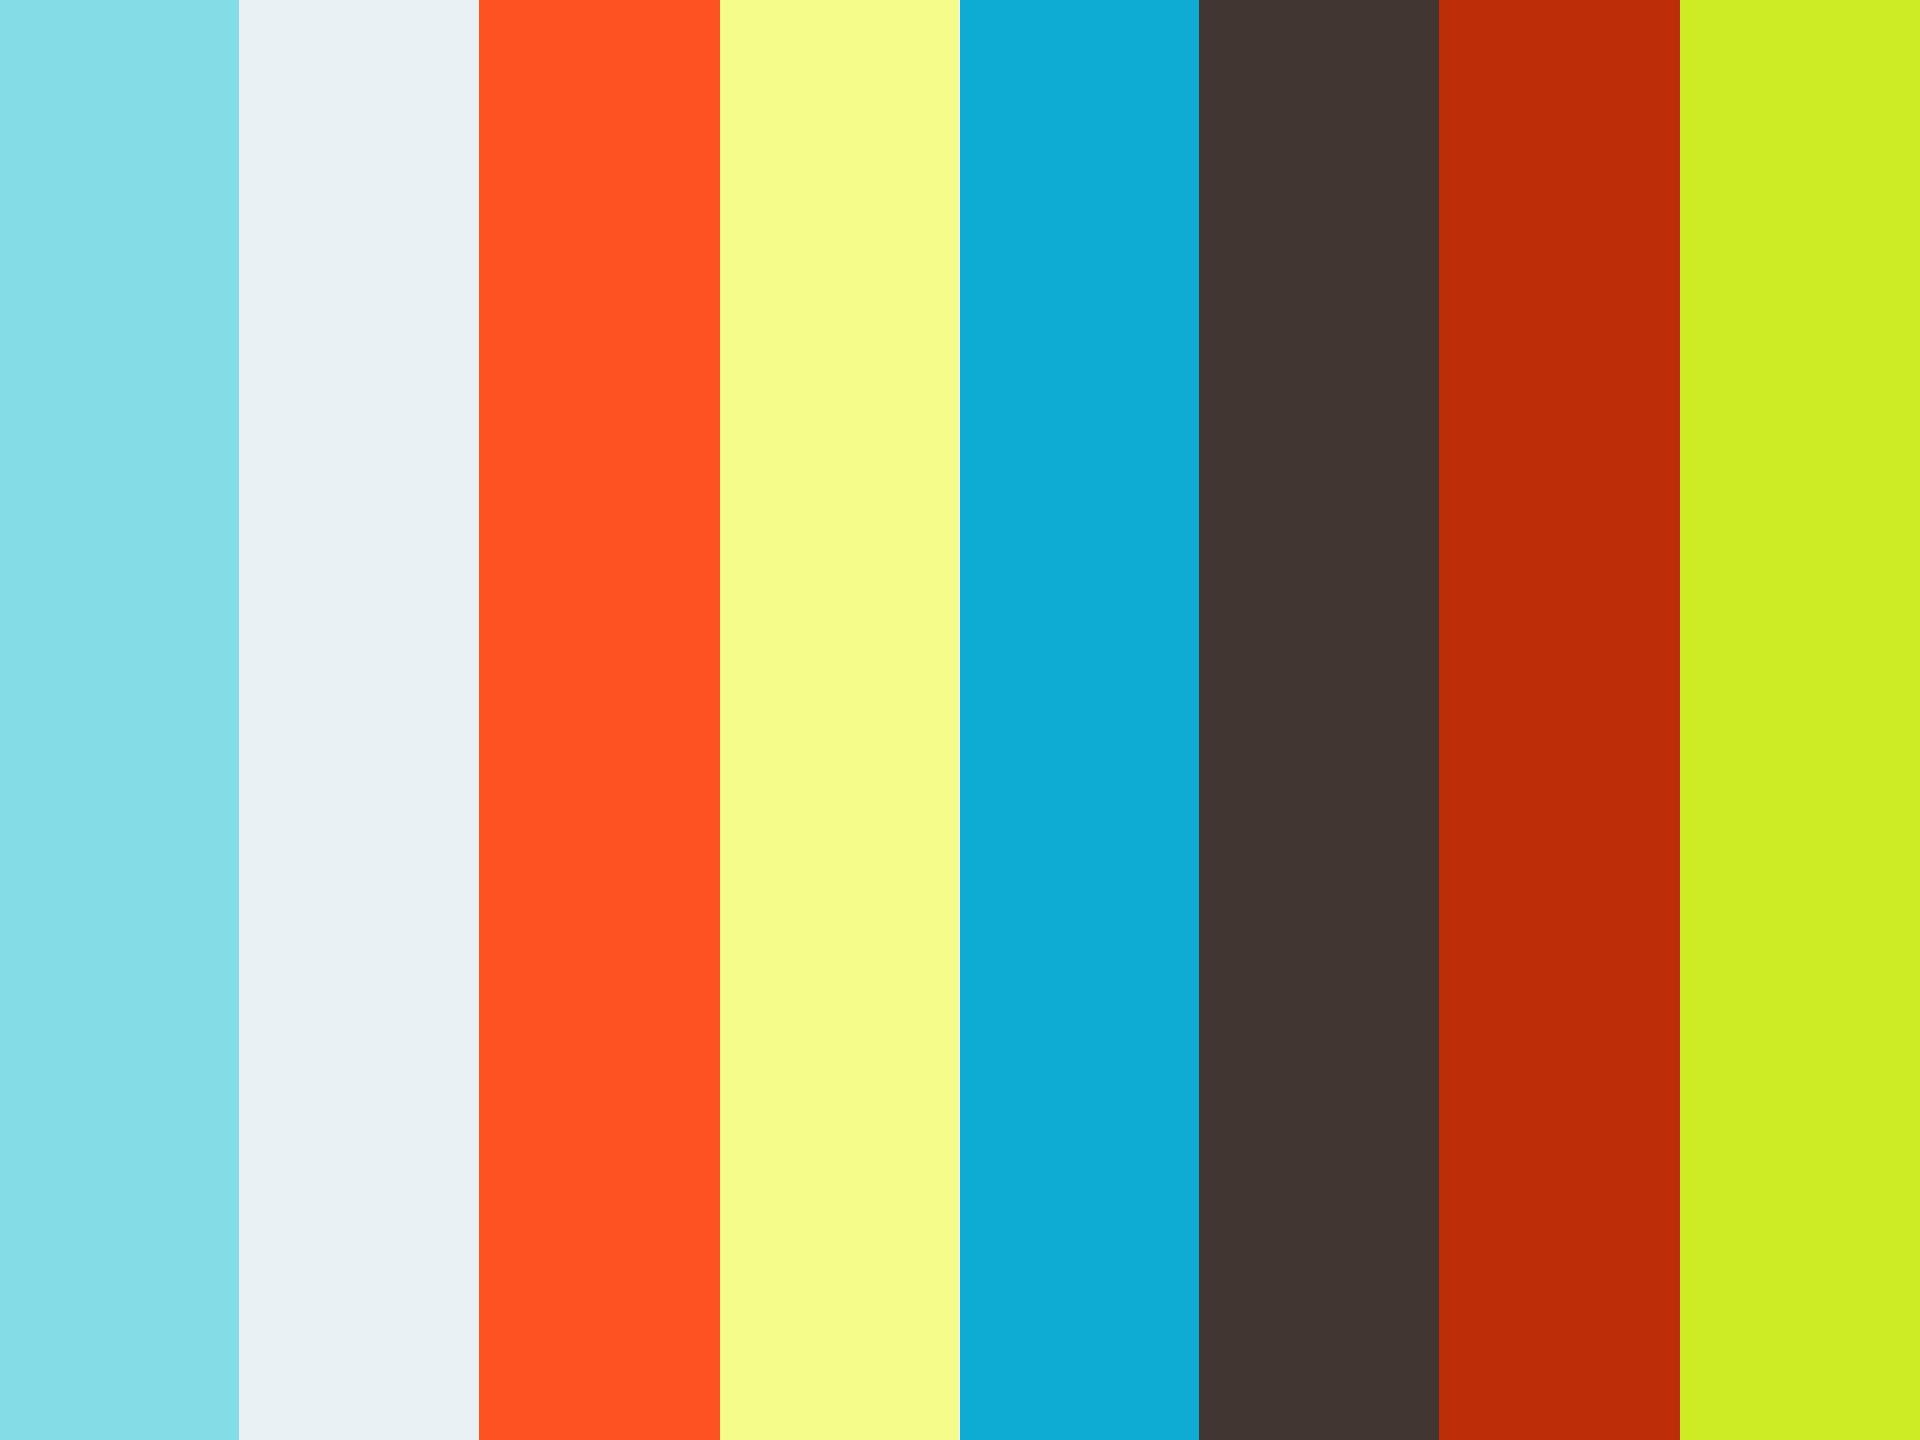 MERCEDES BENZ C300 - SILVER - 2020